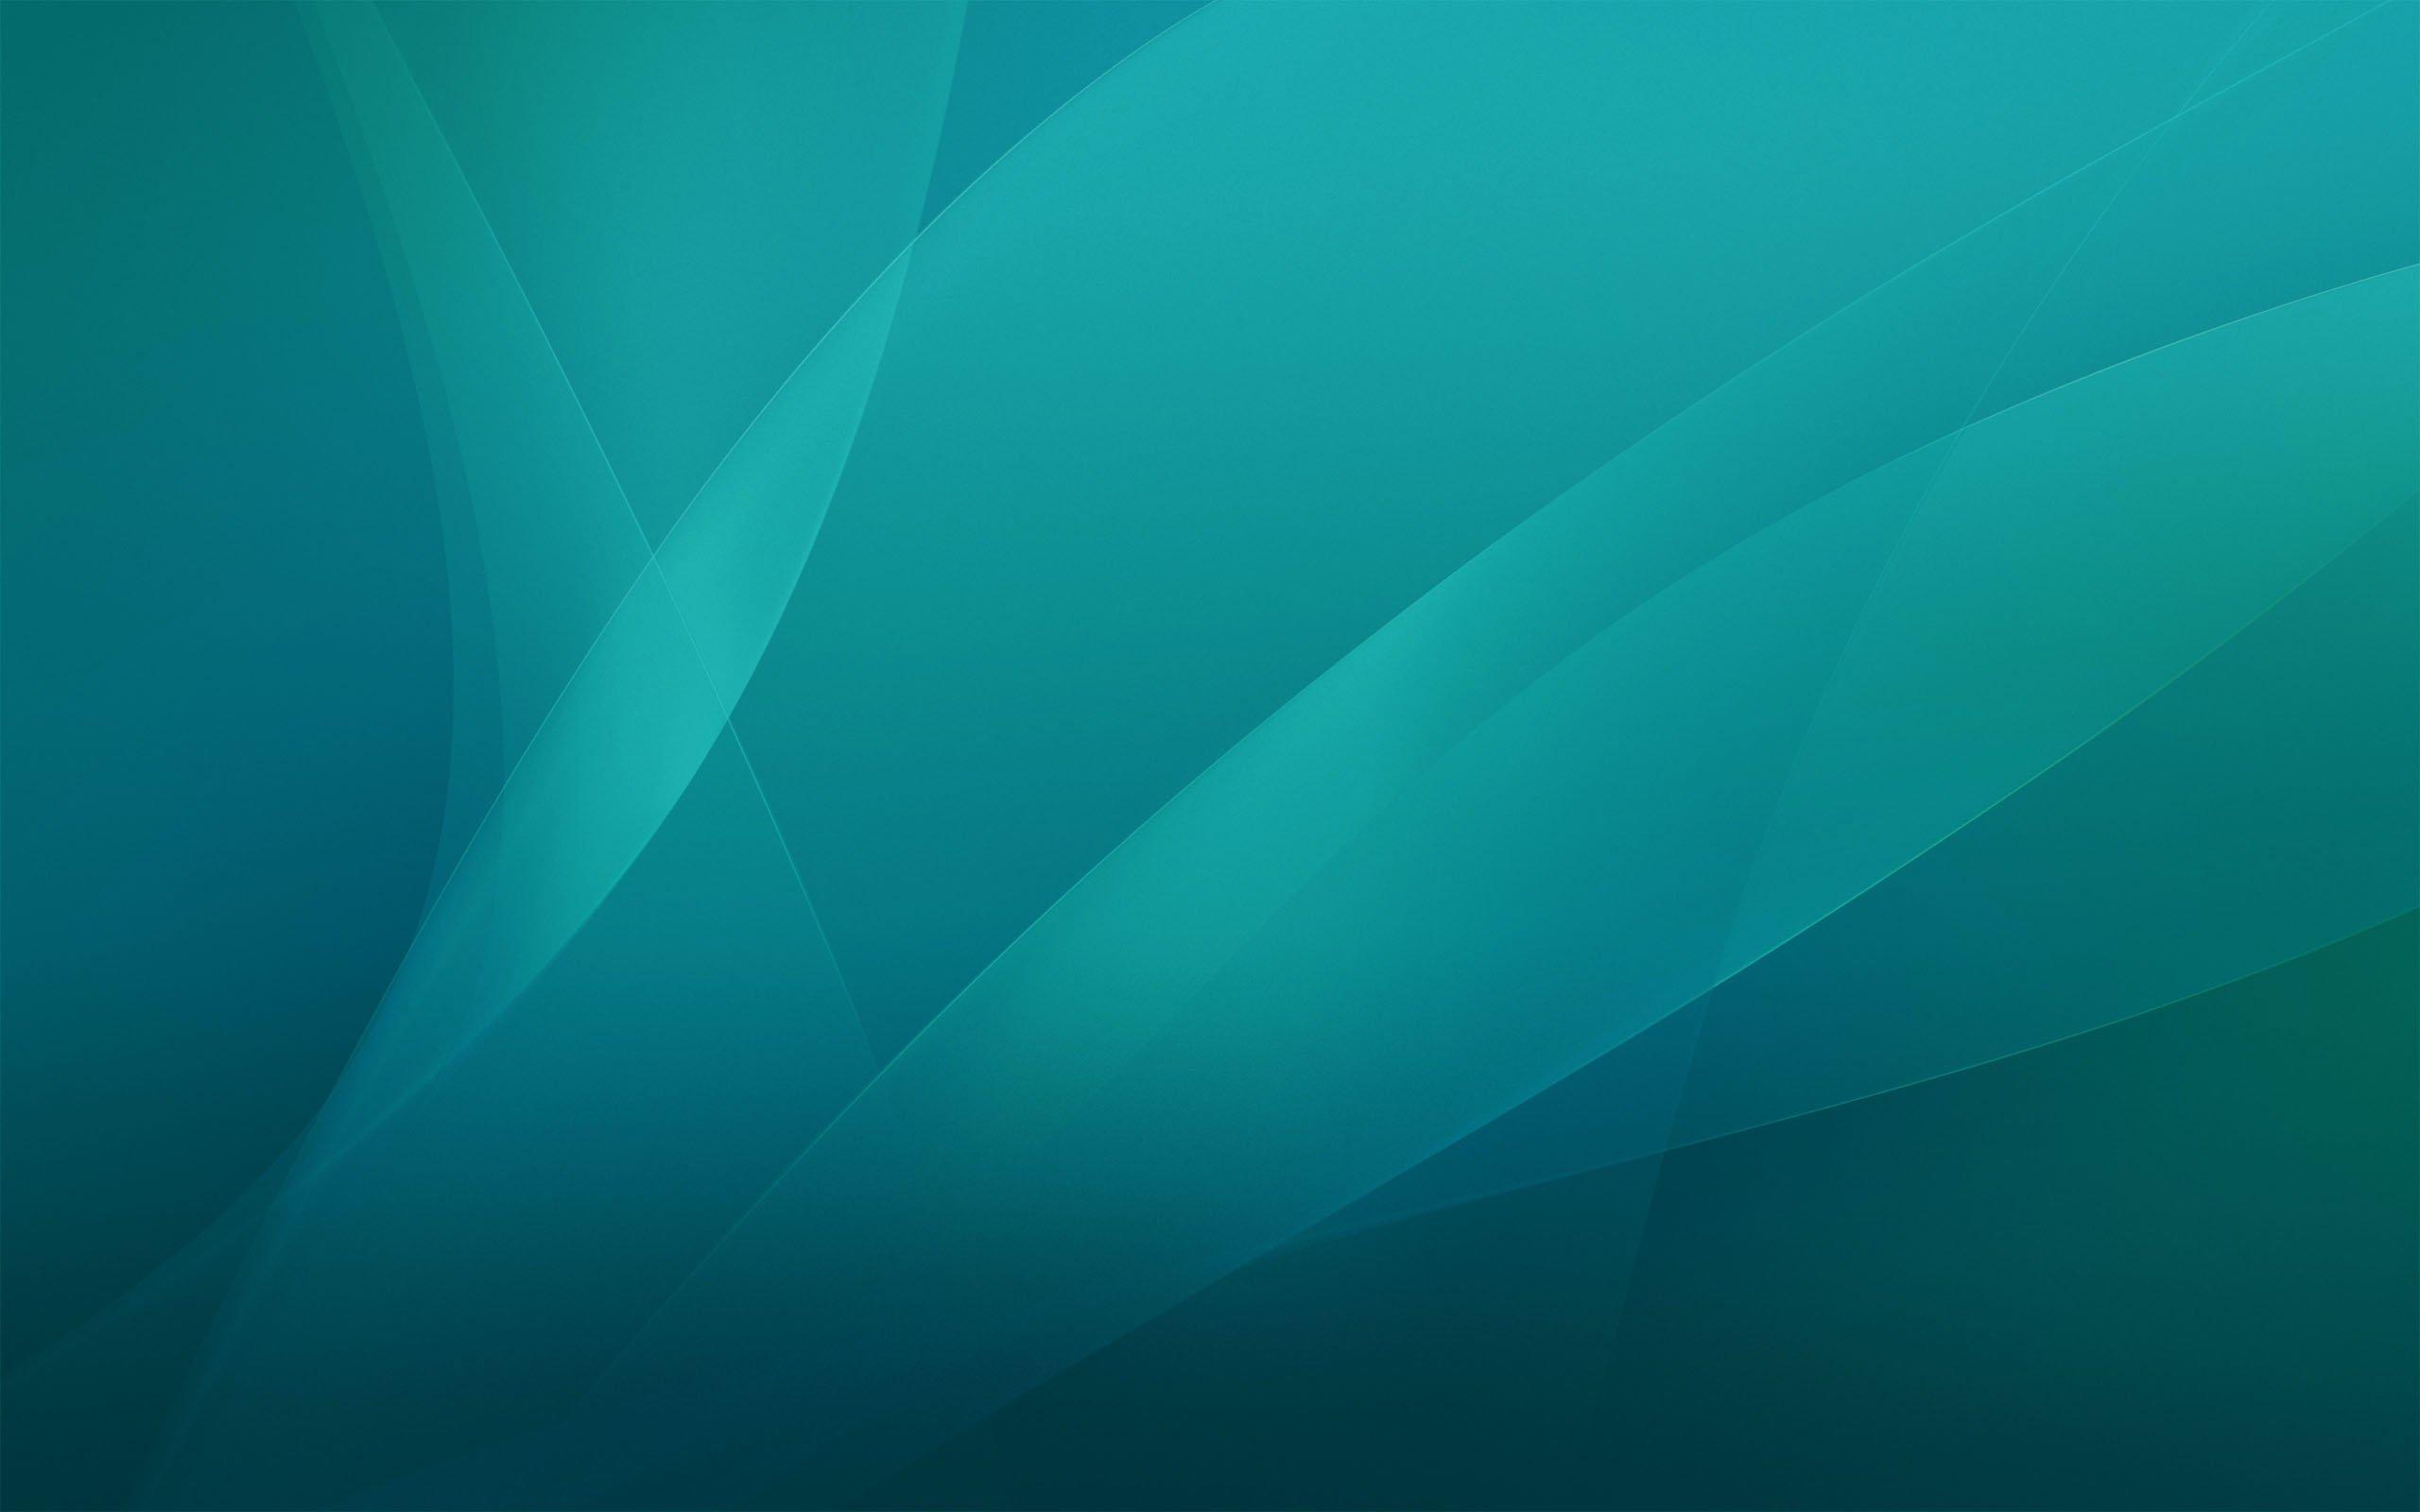 Aqua colored wallpaper wallpapersafari - Green and turquoise wallpaper ...